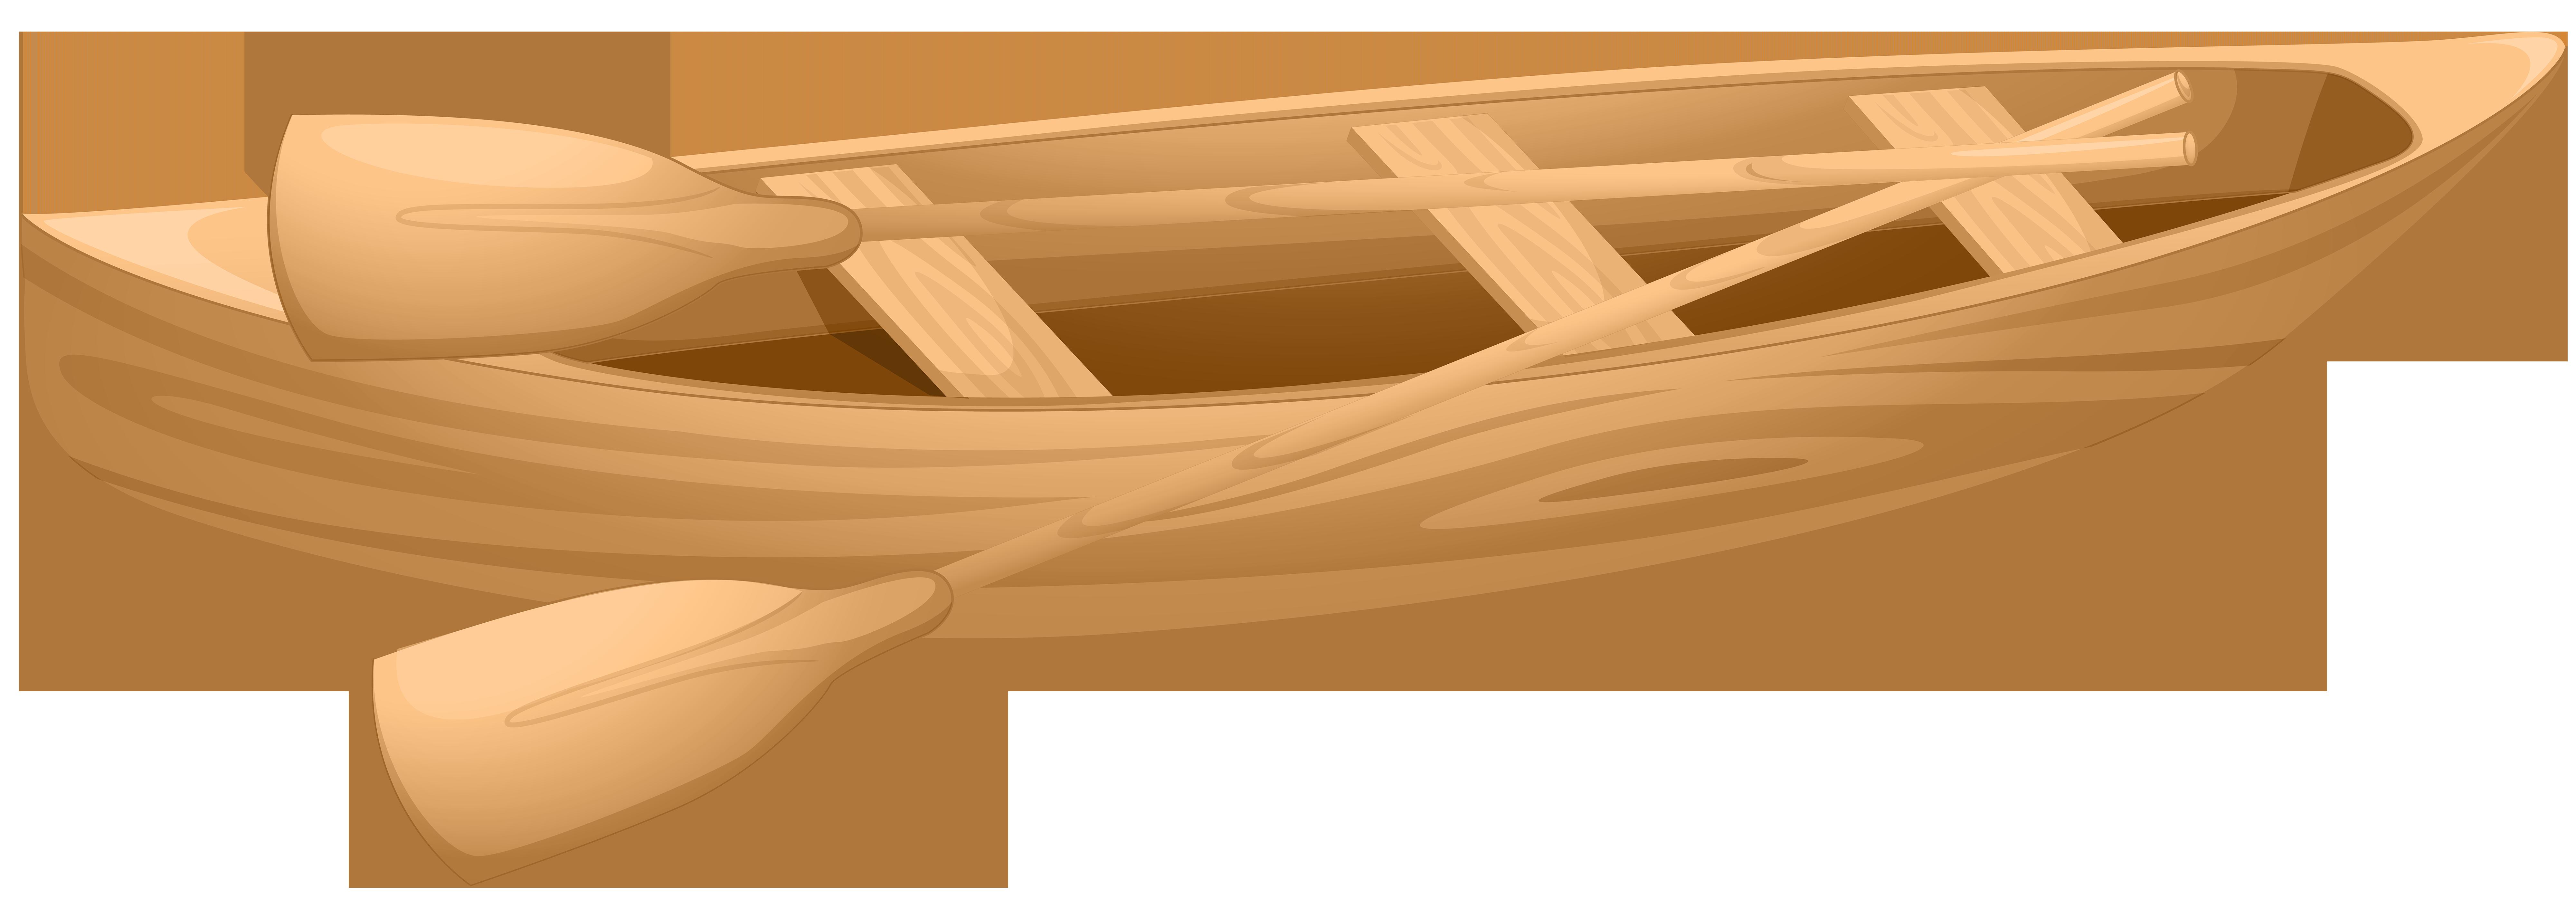 Clipart boat wood. Wooden clip art png